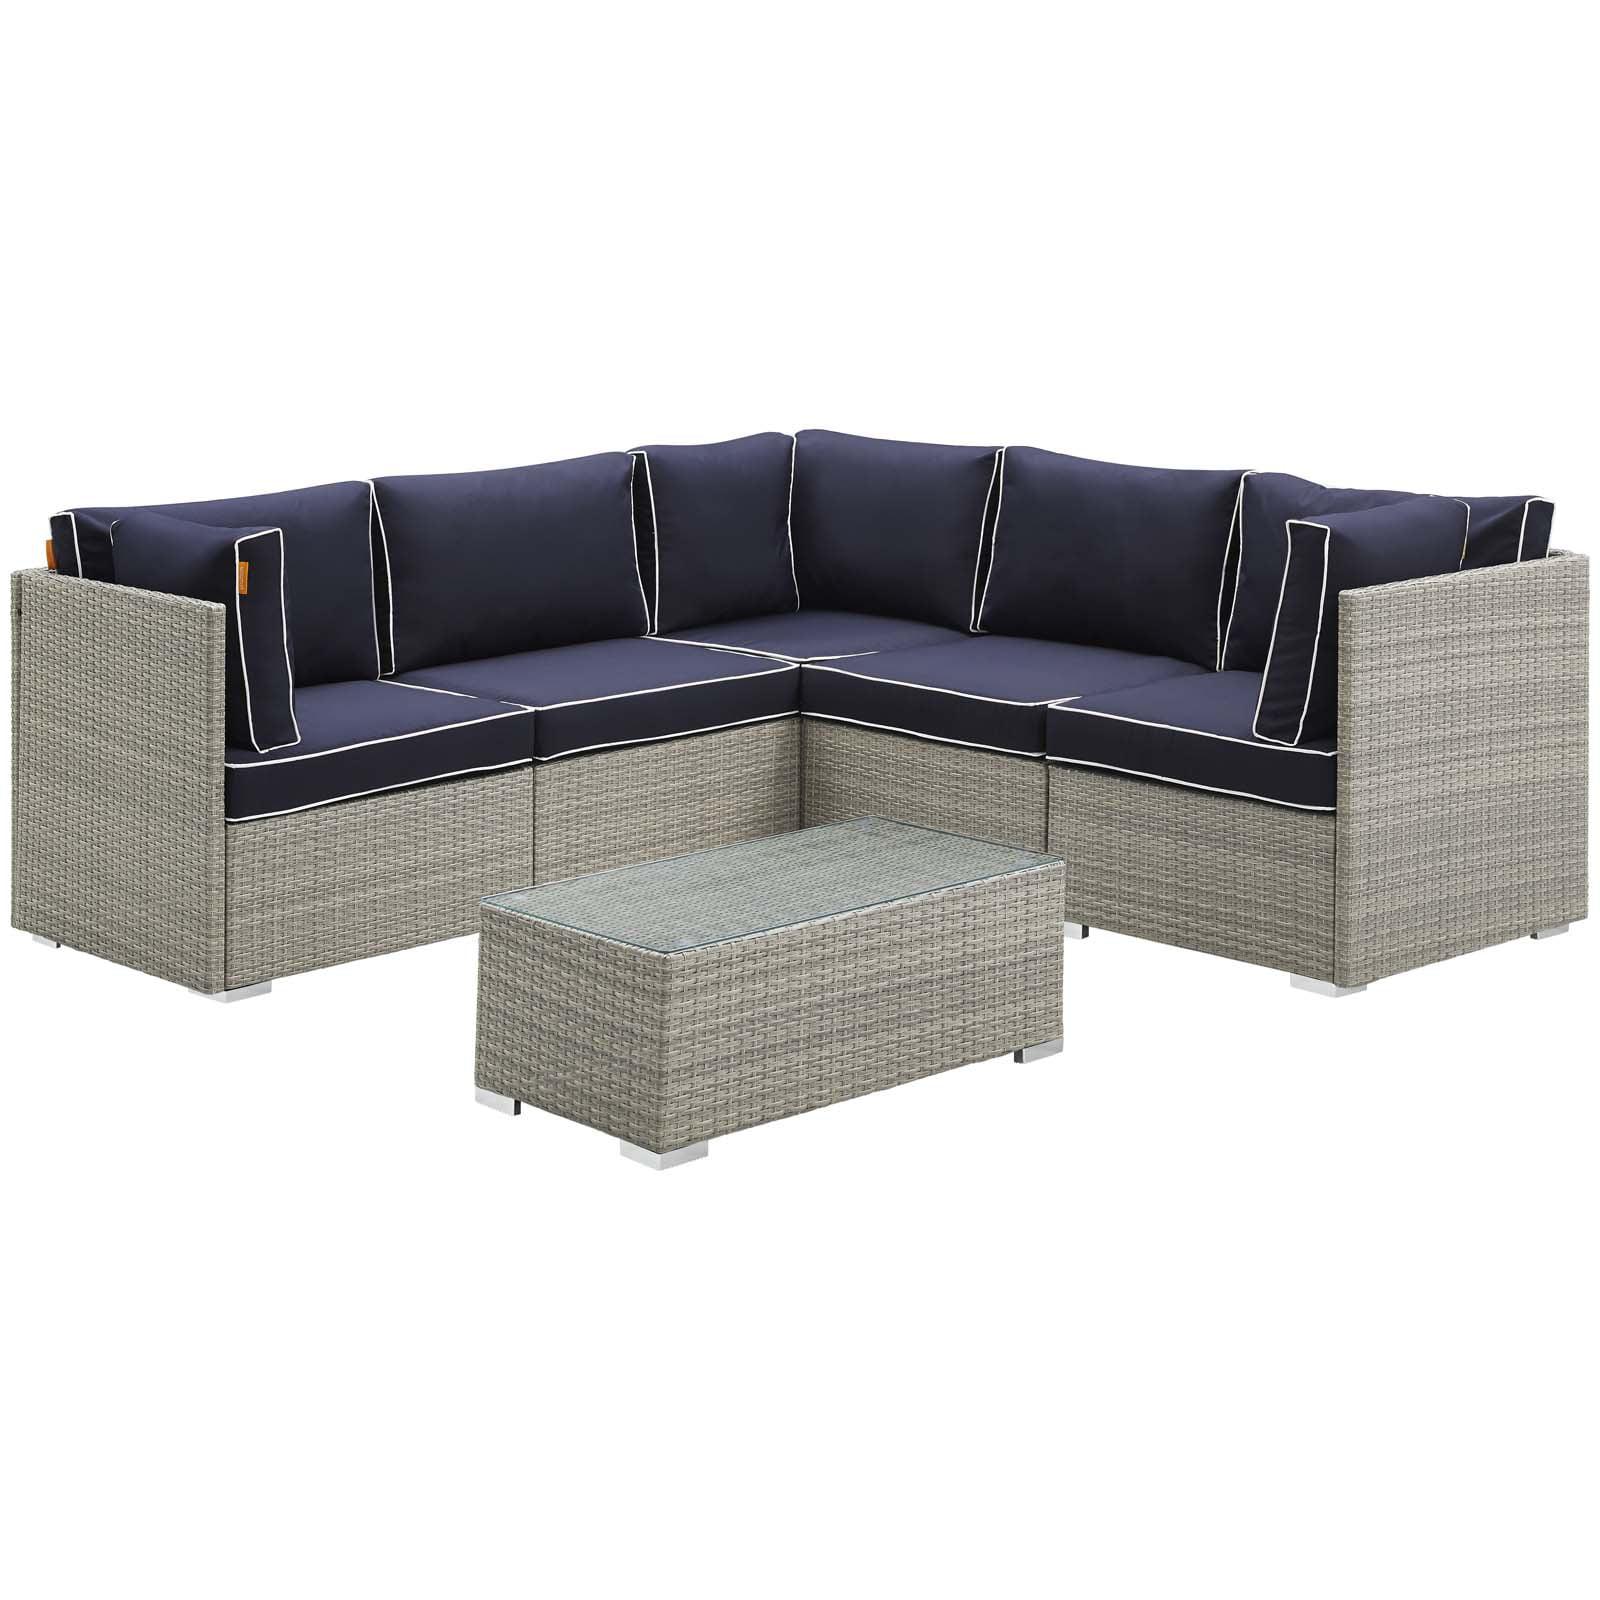 Modern Contemporary Outdoor Patio Balcony Garden Furniture Lounge Sectional Sofa and Table Set, Sunbrella Rattan Wicker, Navy Blue Light Gray